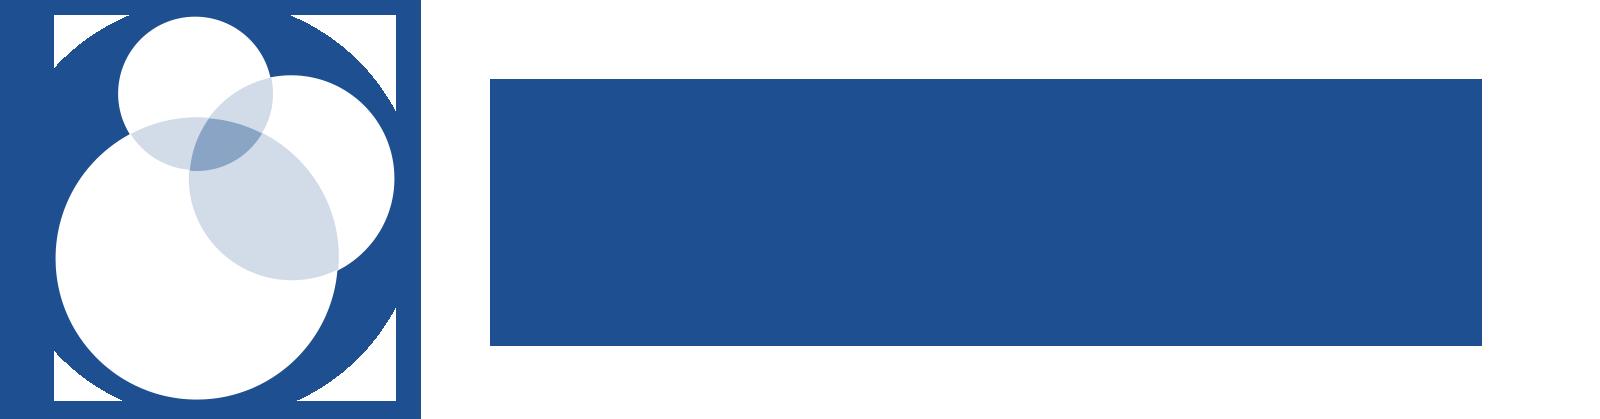 NAFI Connecticut, Inc. Company Logo